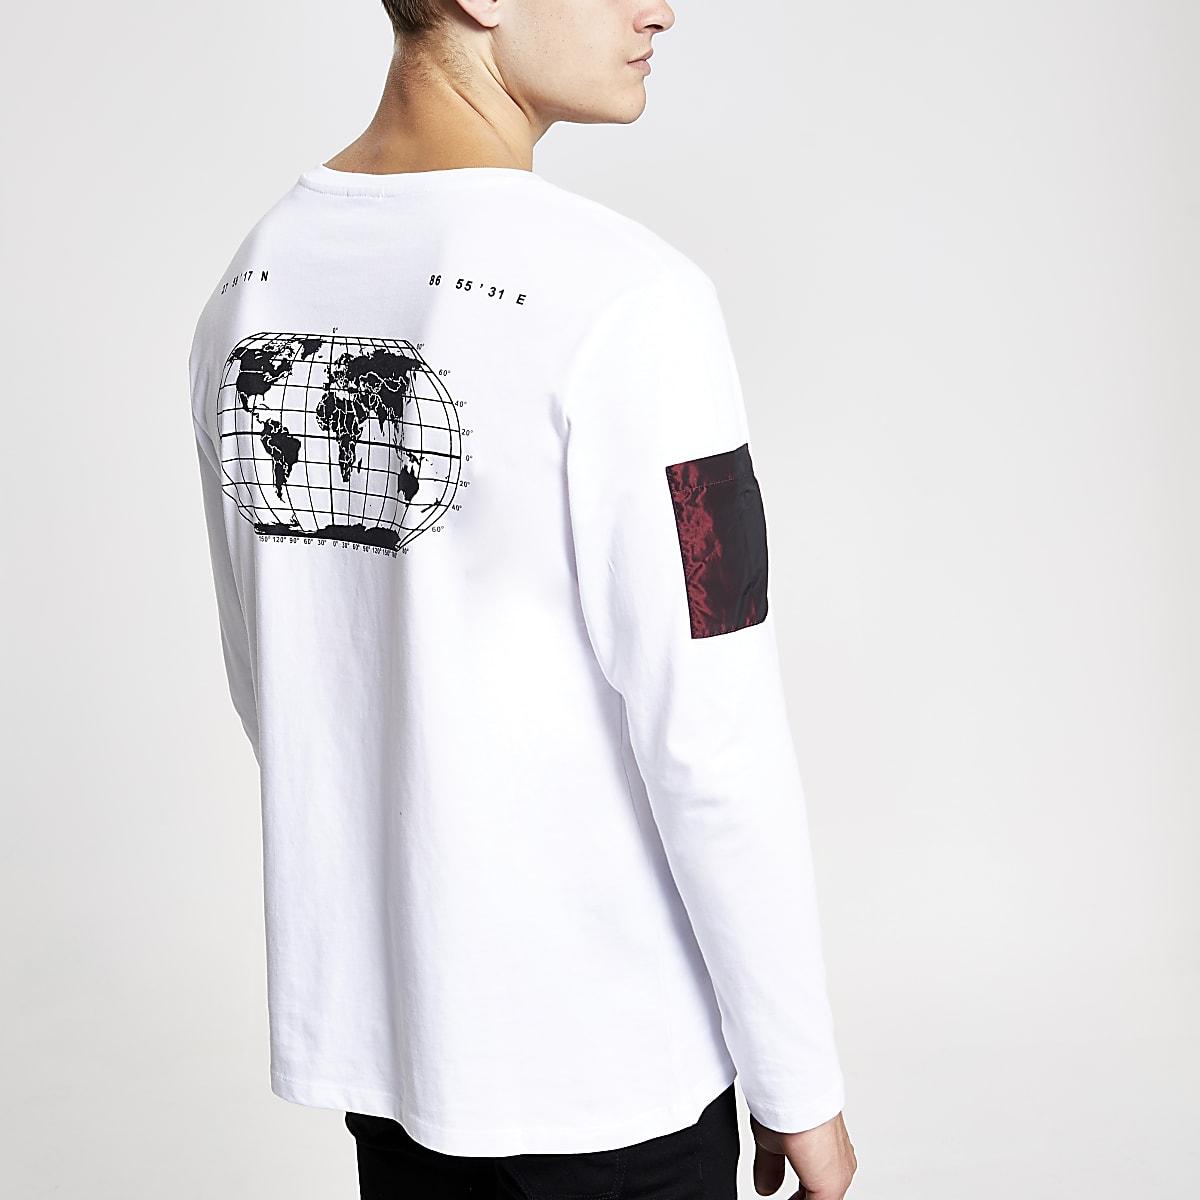 Jack and Jones – T-shirt blanc à manches longues